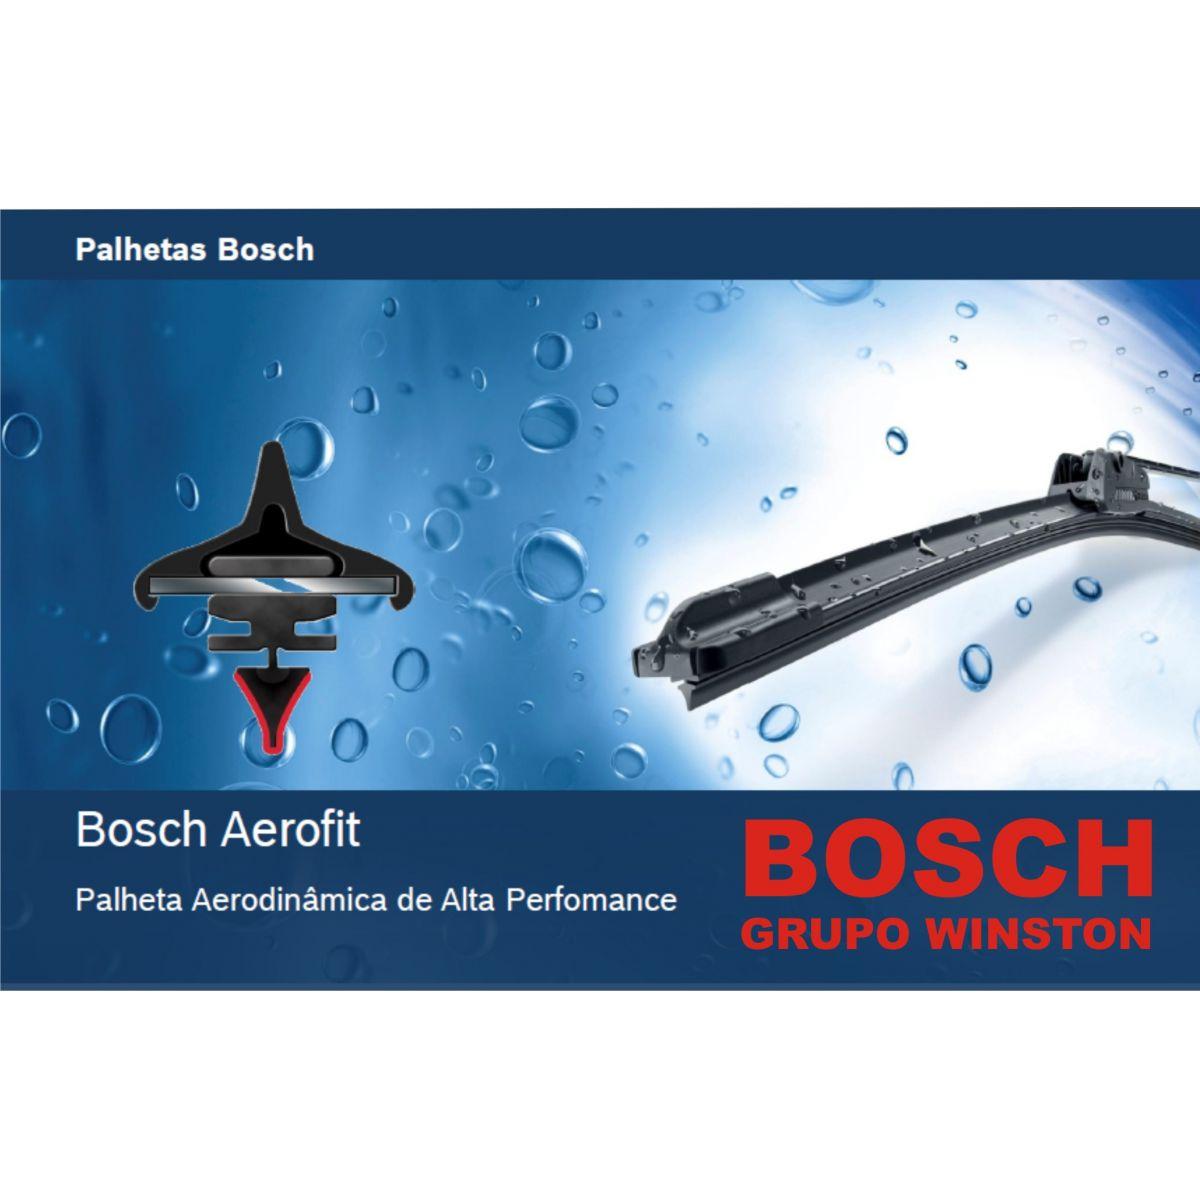 Palheta Bosch Aerofit Limpador de para brisa Bosch DAEWOO Espero Lanos